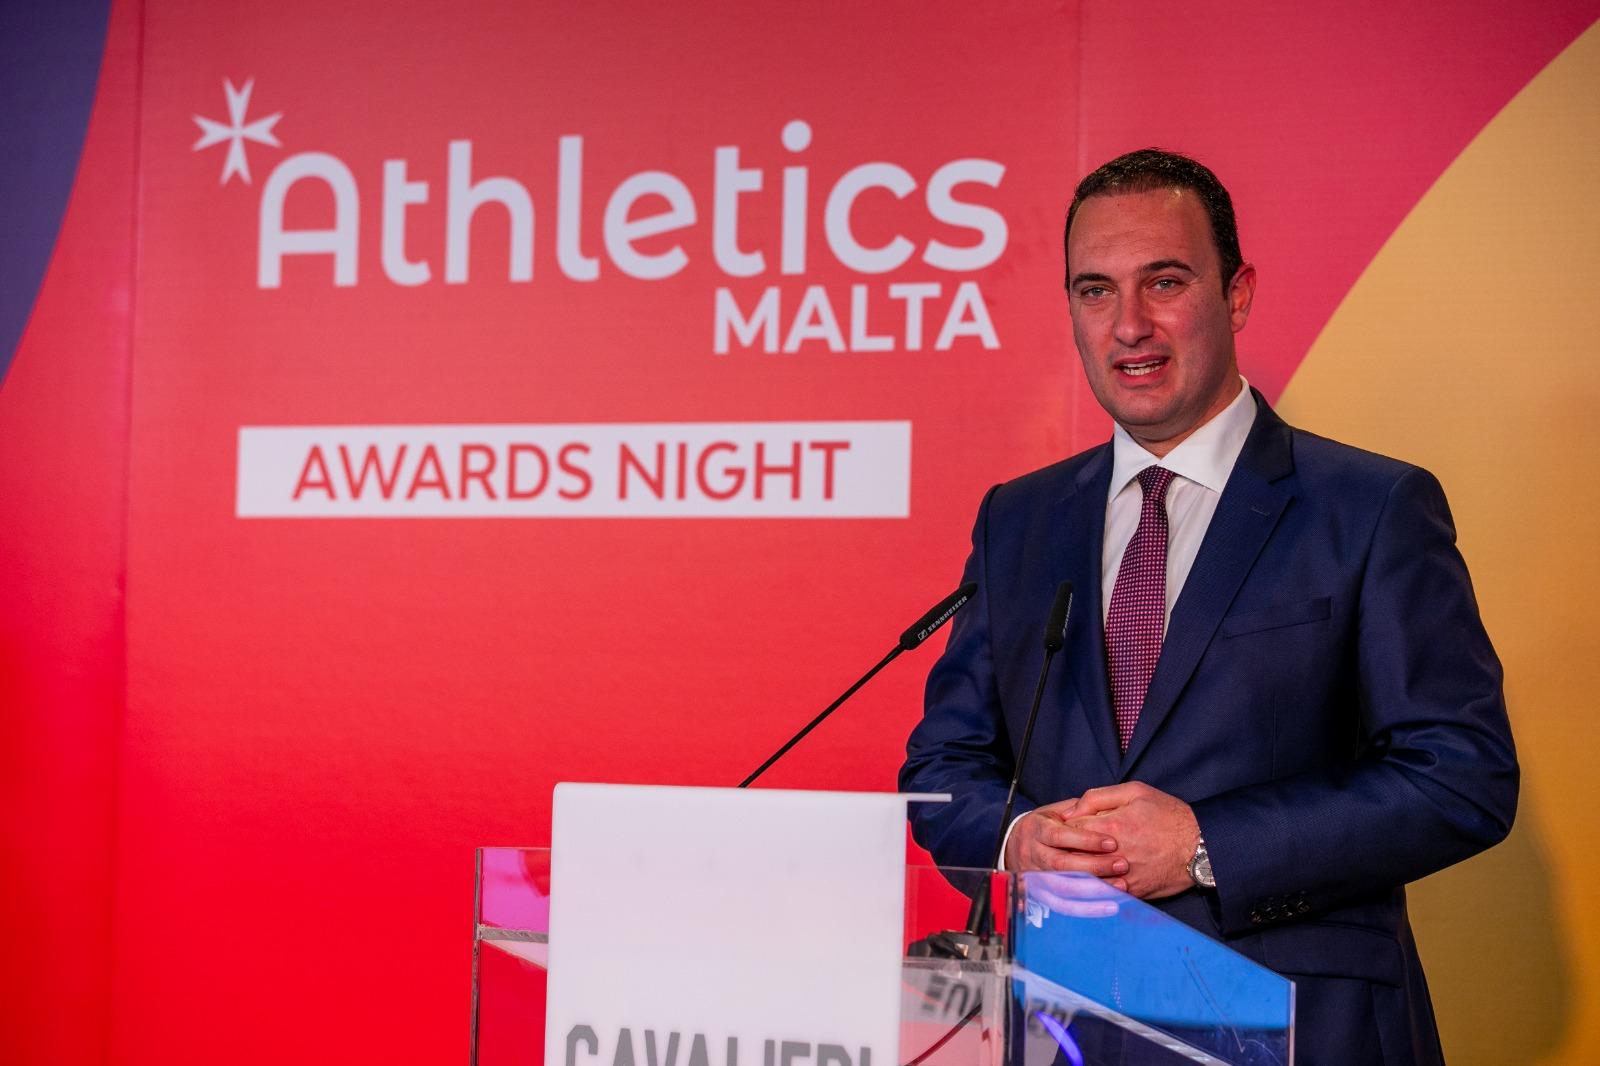 Janet Richard, Luke Farrugia win Athlete of the Year Award for 2020